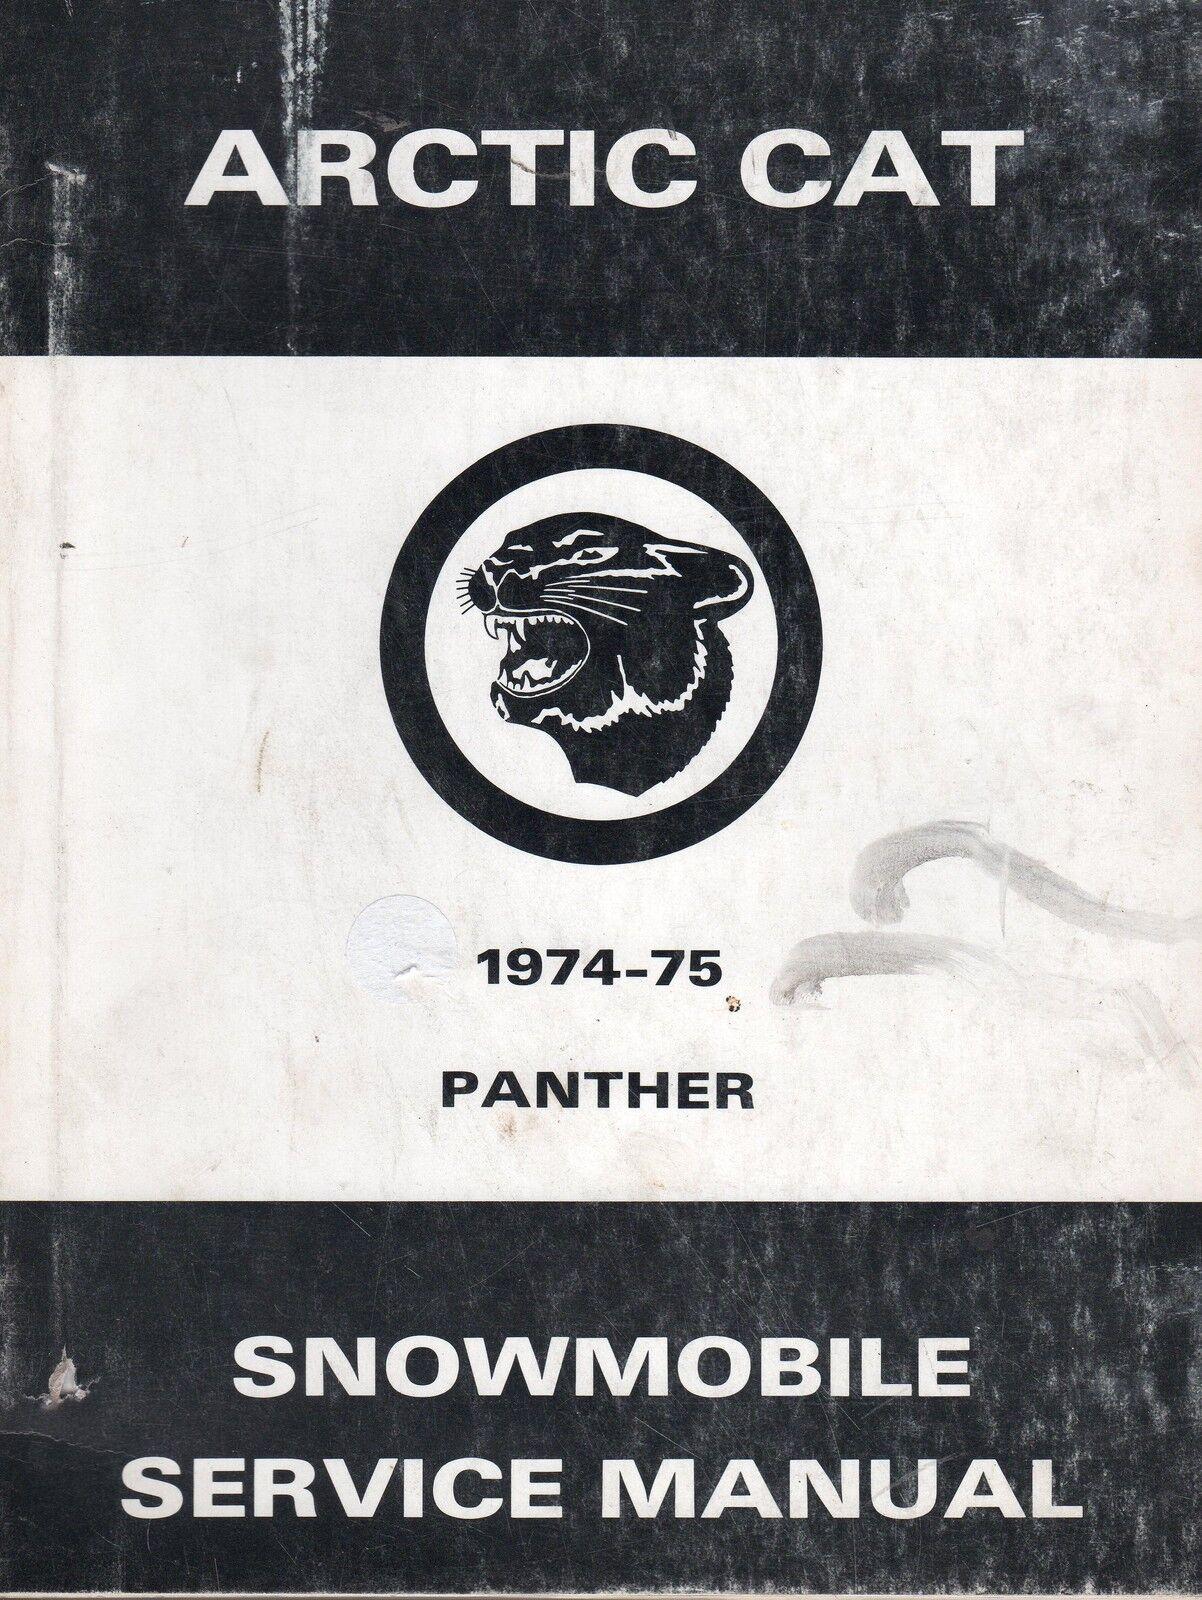 HUGE 1974-75 ARCTIC CAT PANTHER SERVICE PARTS MANUAL & PARTS SERVICE MANUALS 40610e